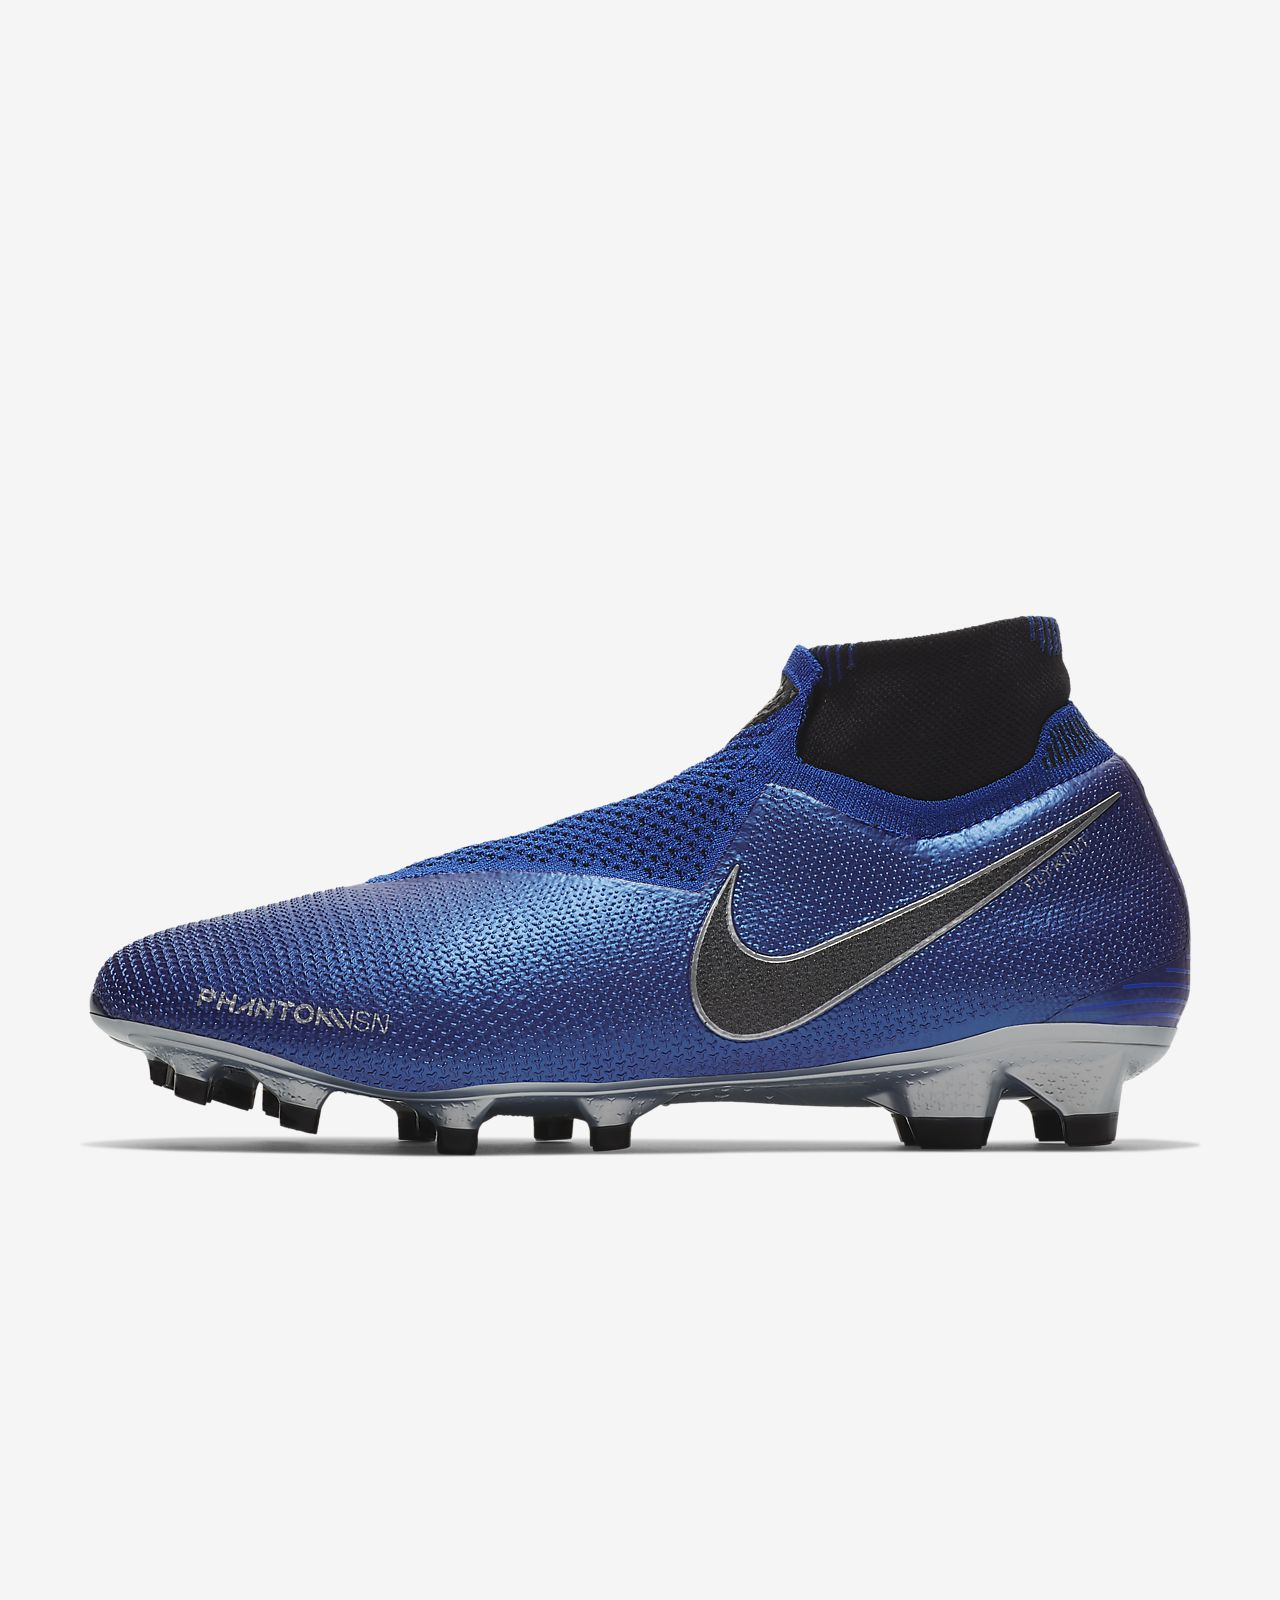 0e9a9eb1ec92 Nike PhantomVSN Elite Dynamic Fit FG Firm-Ground Football Boot. Nike ...